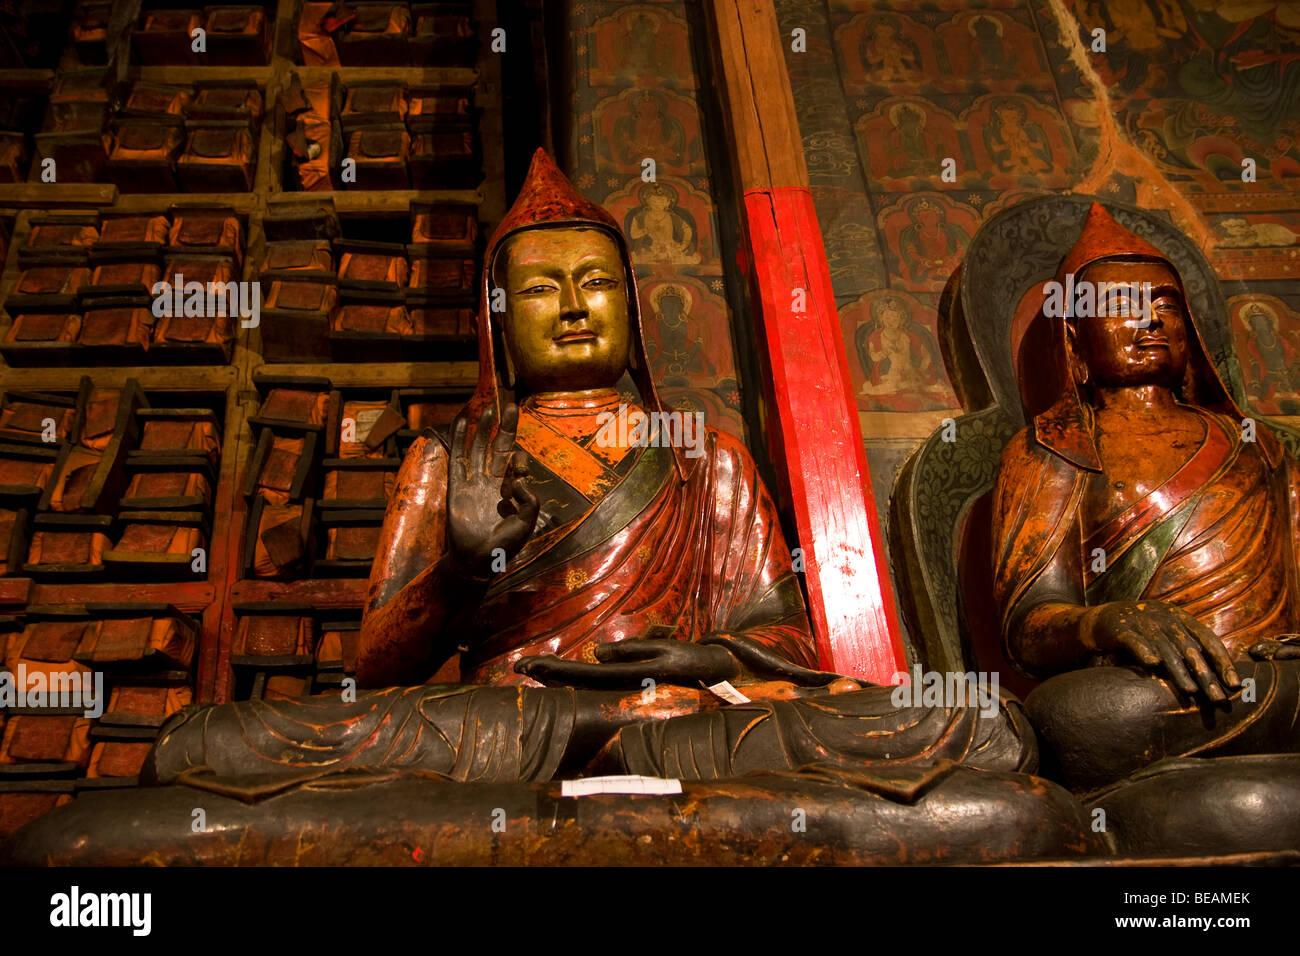 Sakya protectors, Pelkhor Chode Temple Complex, Gyantse, Tibet, China - Stock Image